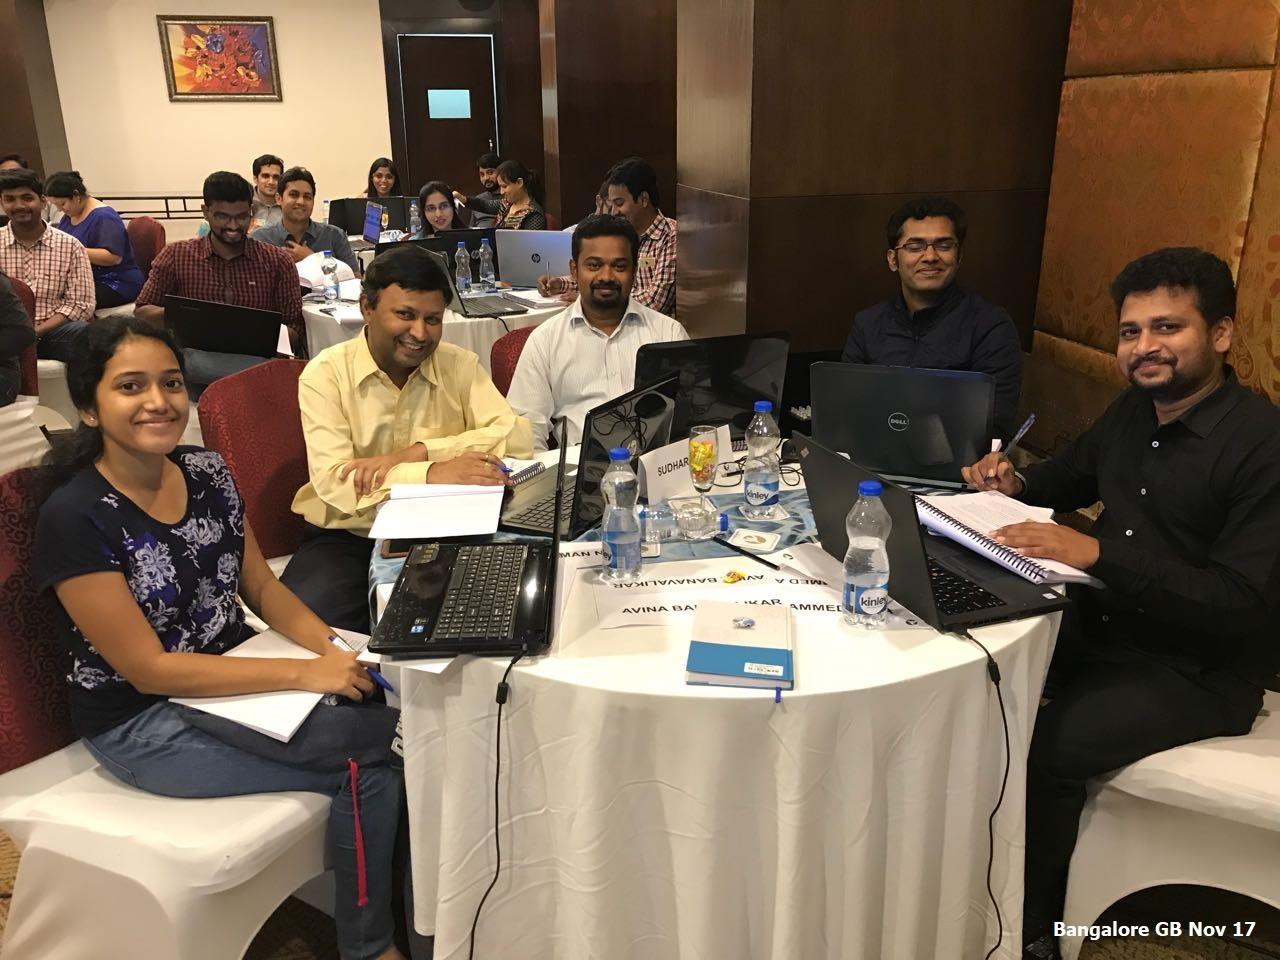 Bangalore GB Nov 17 - Team 6